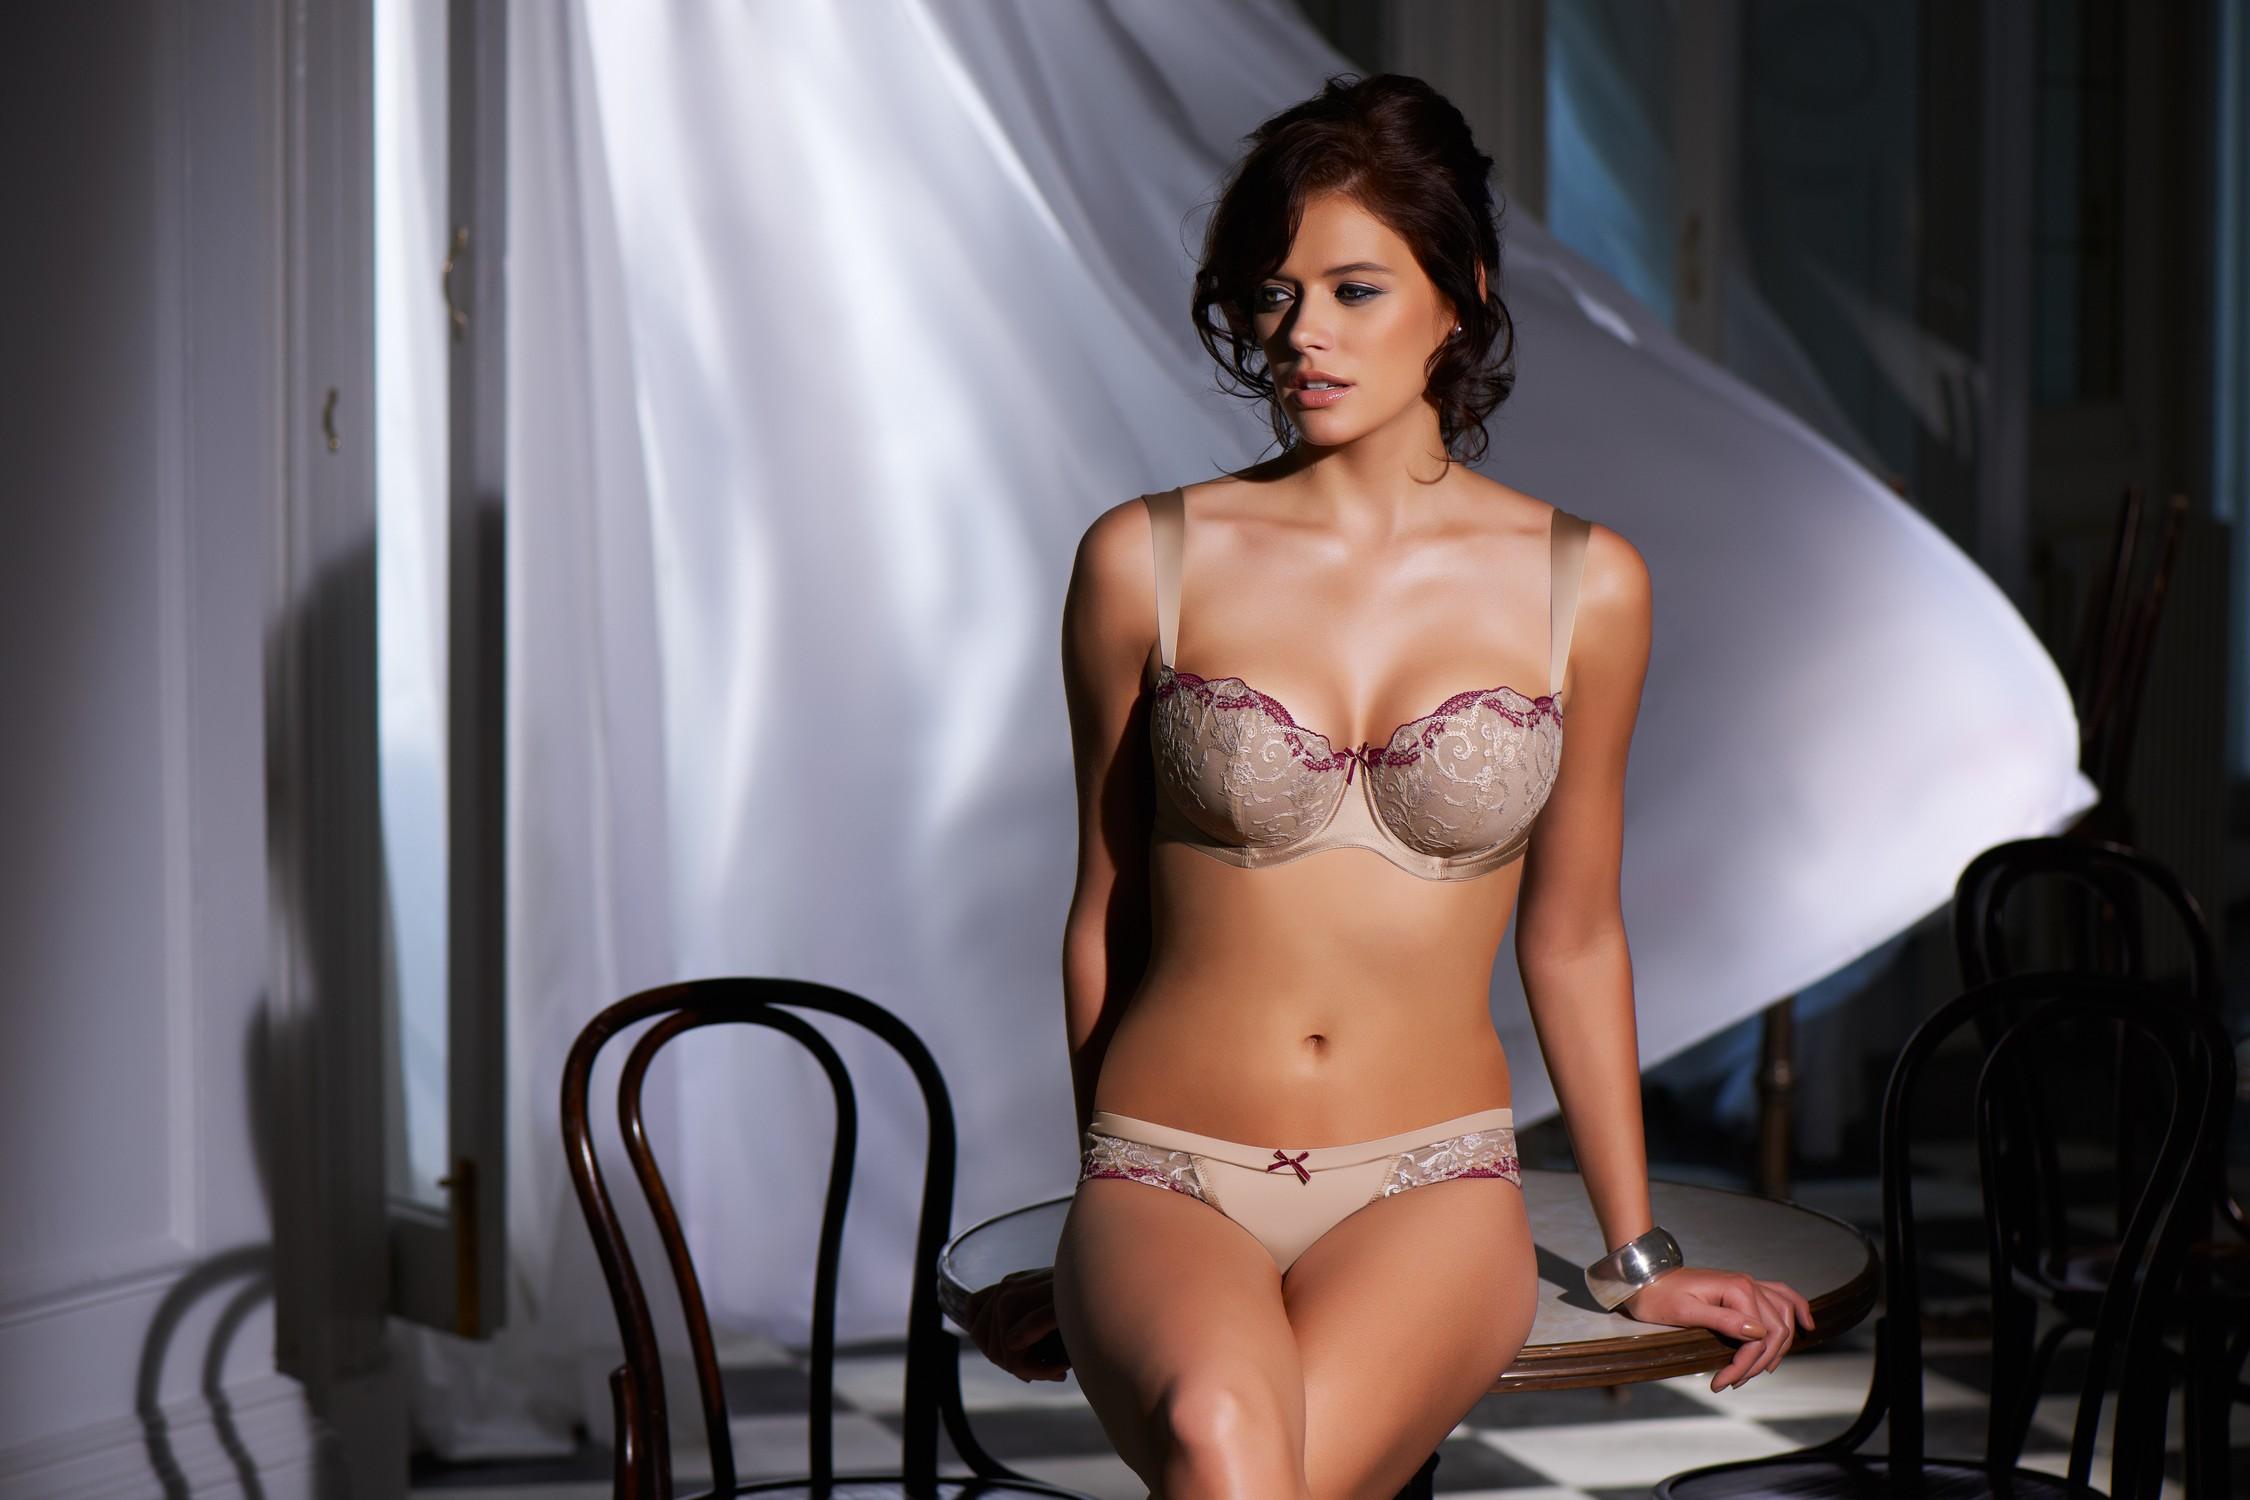 Sexy Natalia Belova Looks Ready To Party | Daily Girls @ Female Update